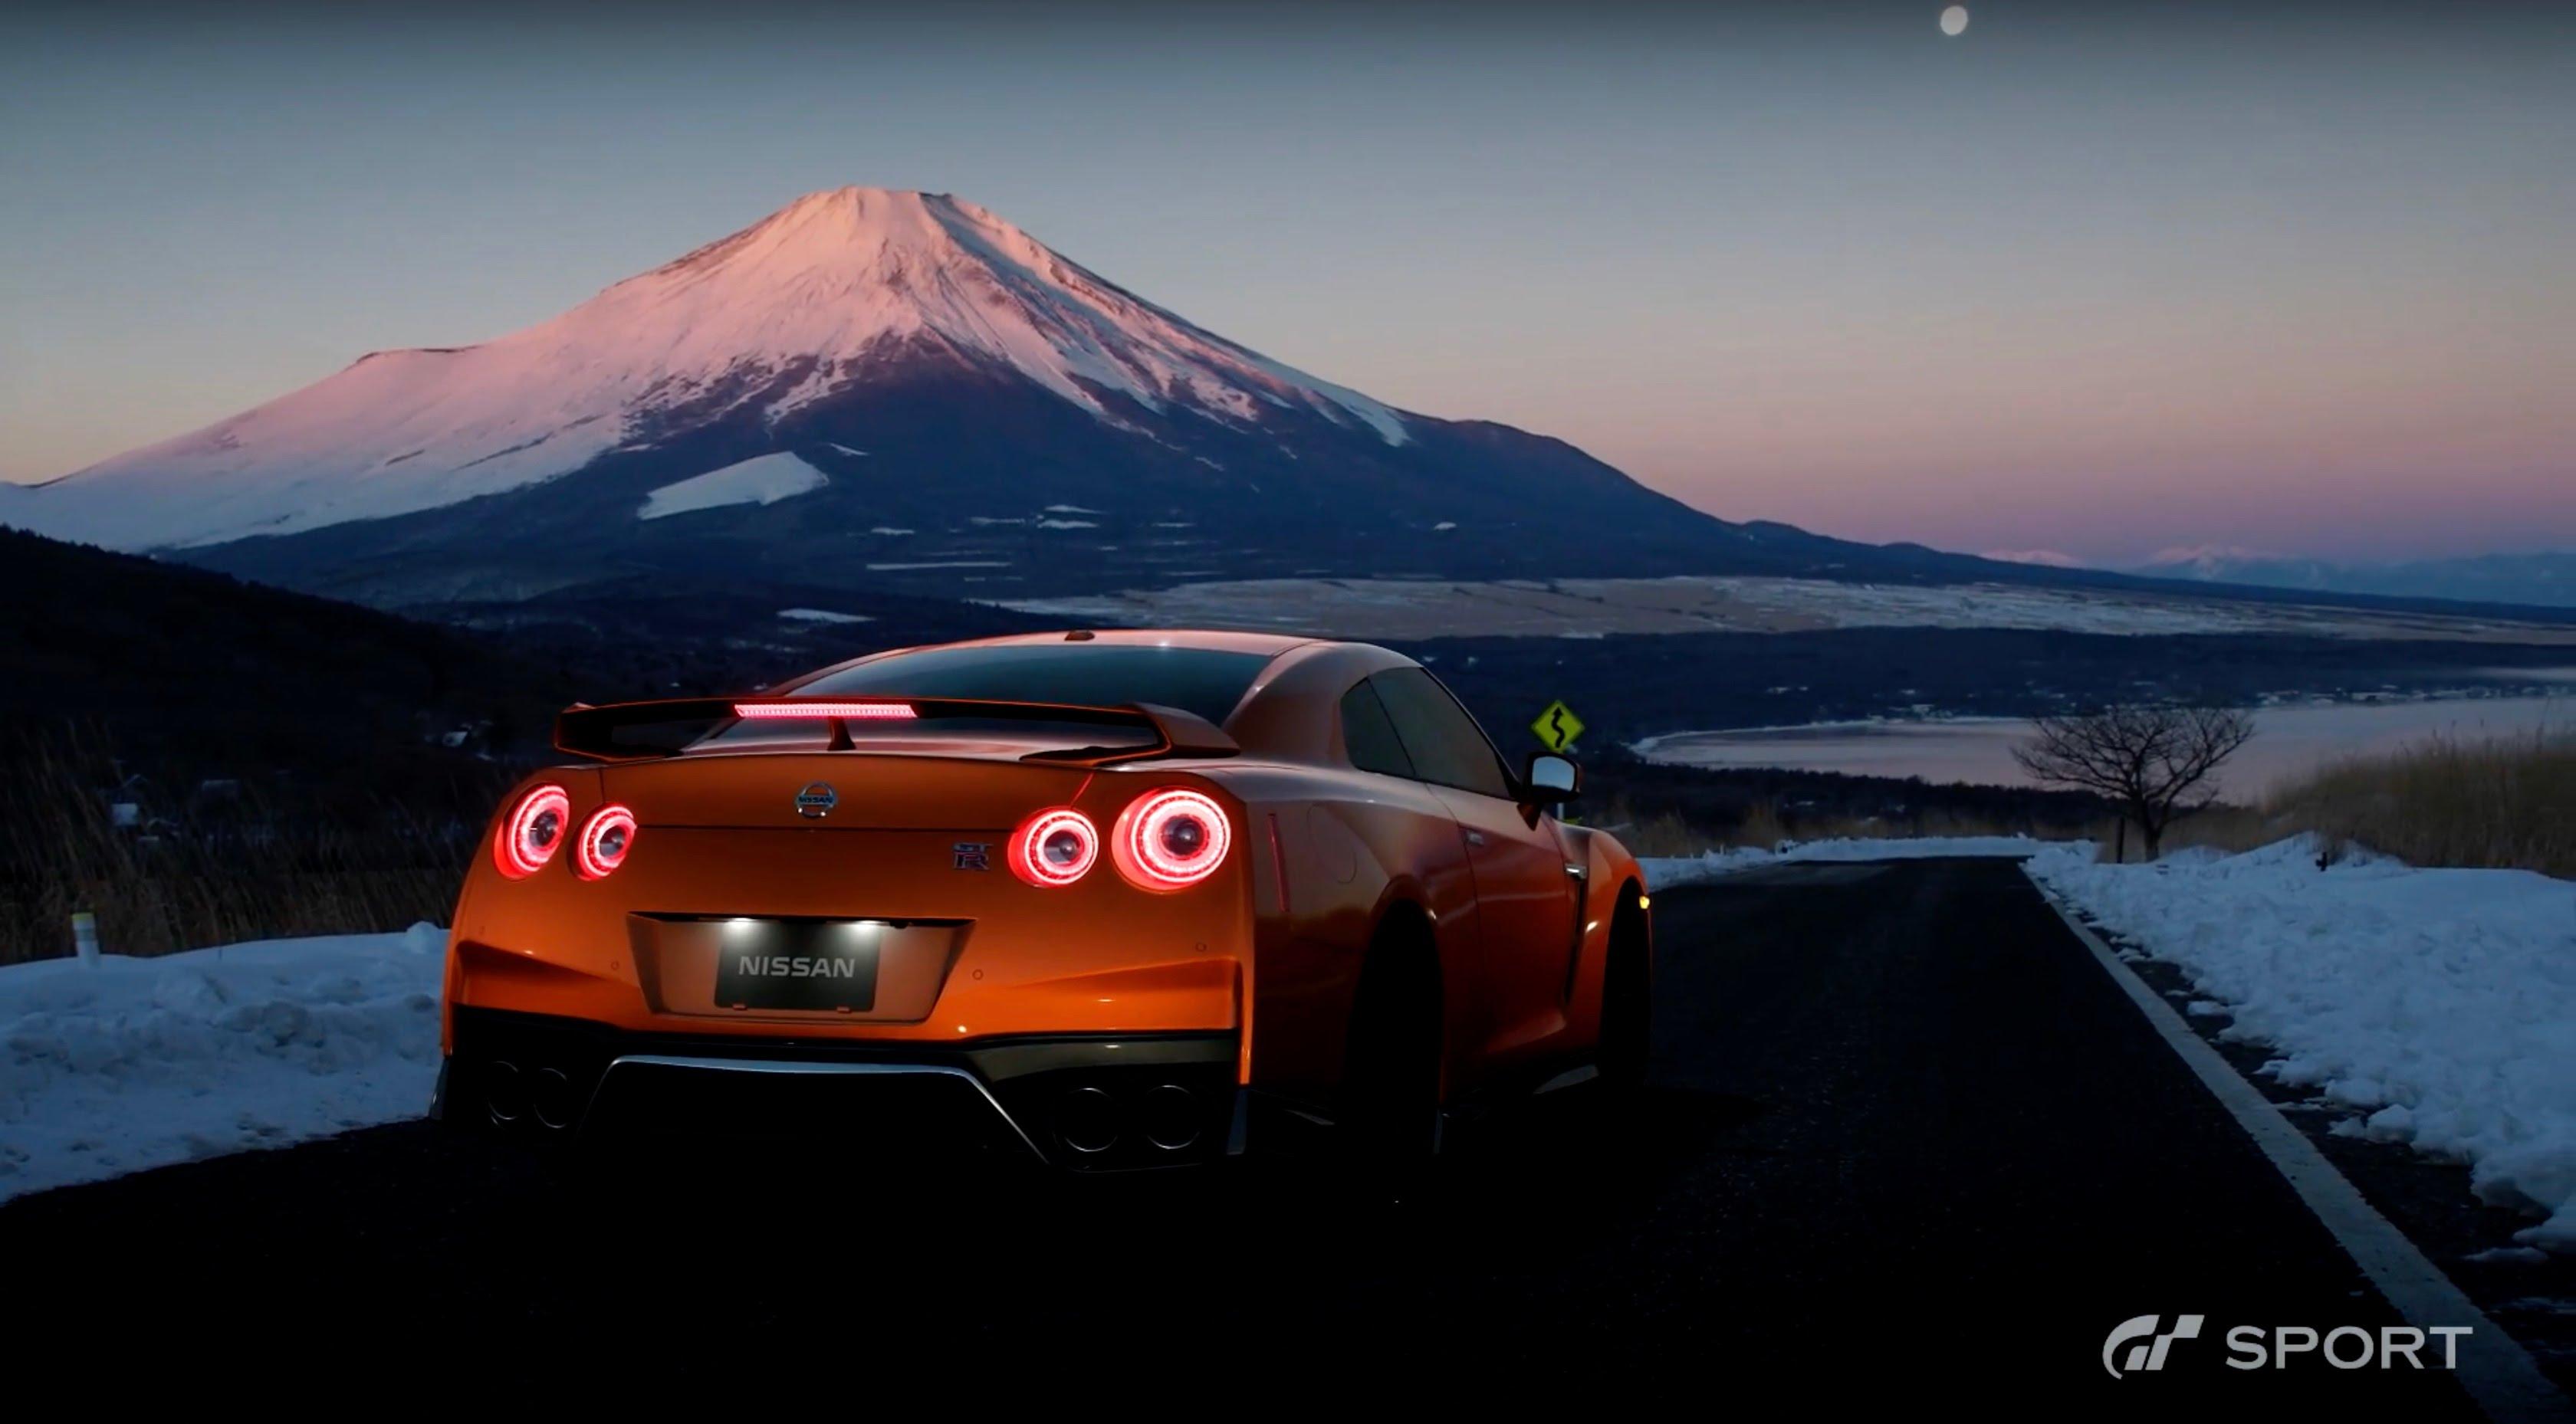 Gran Turismo Sport HD Wallpaper Background Image 3360x1858 3360x1858